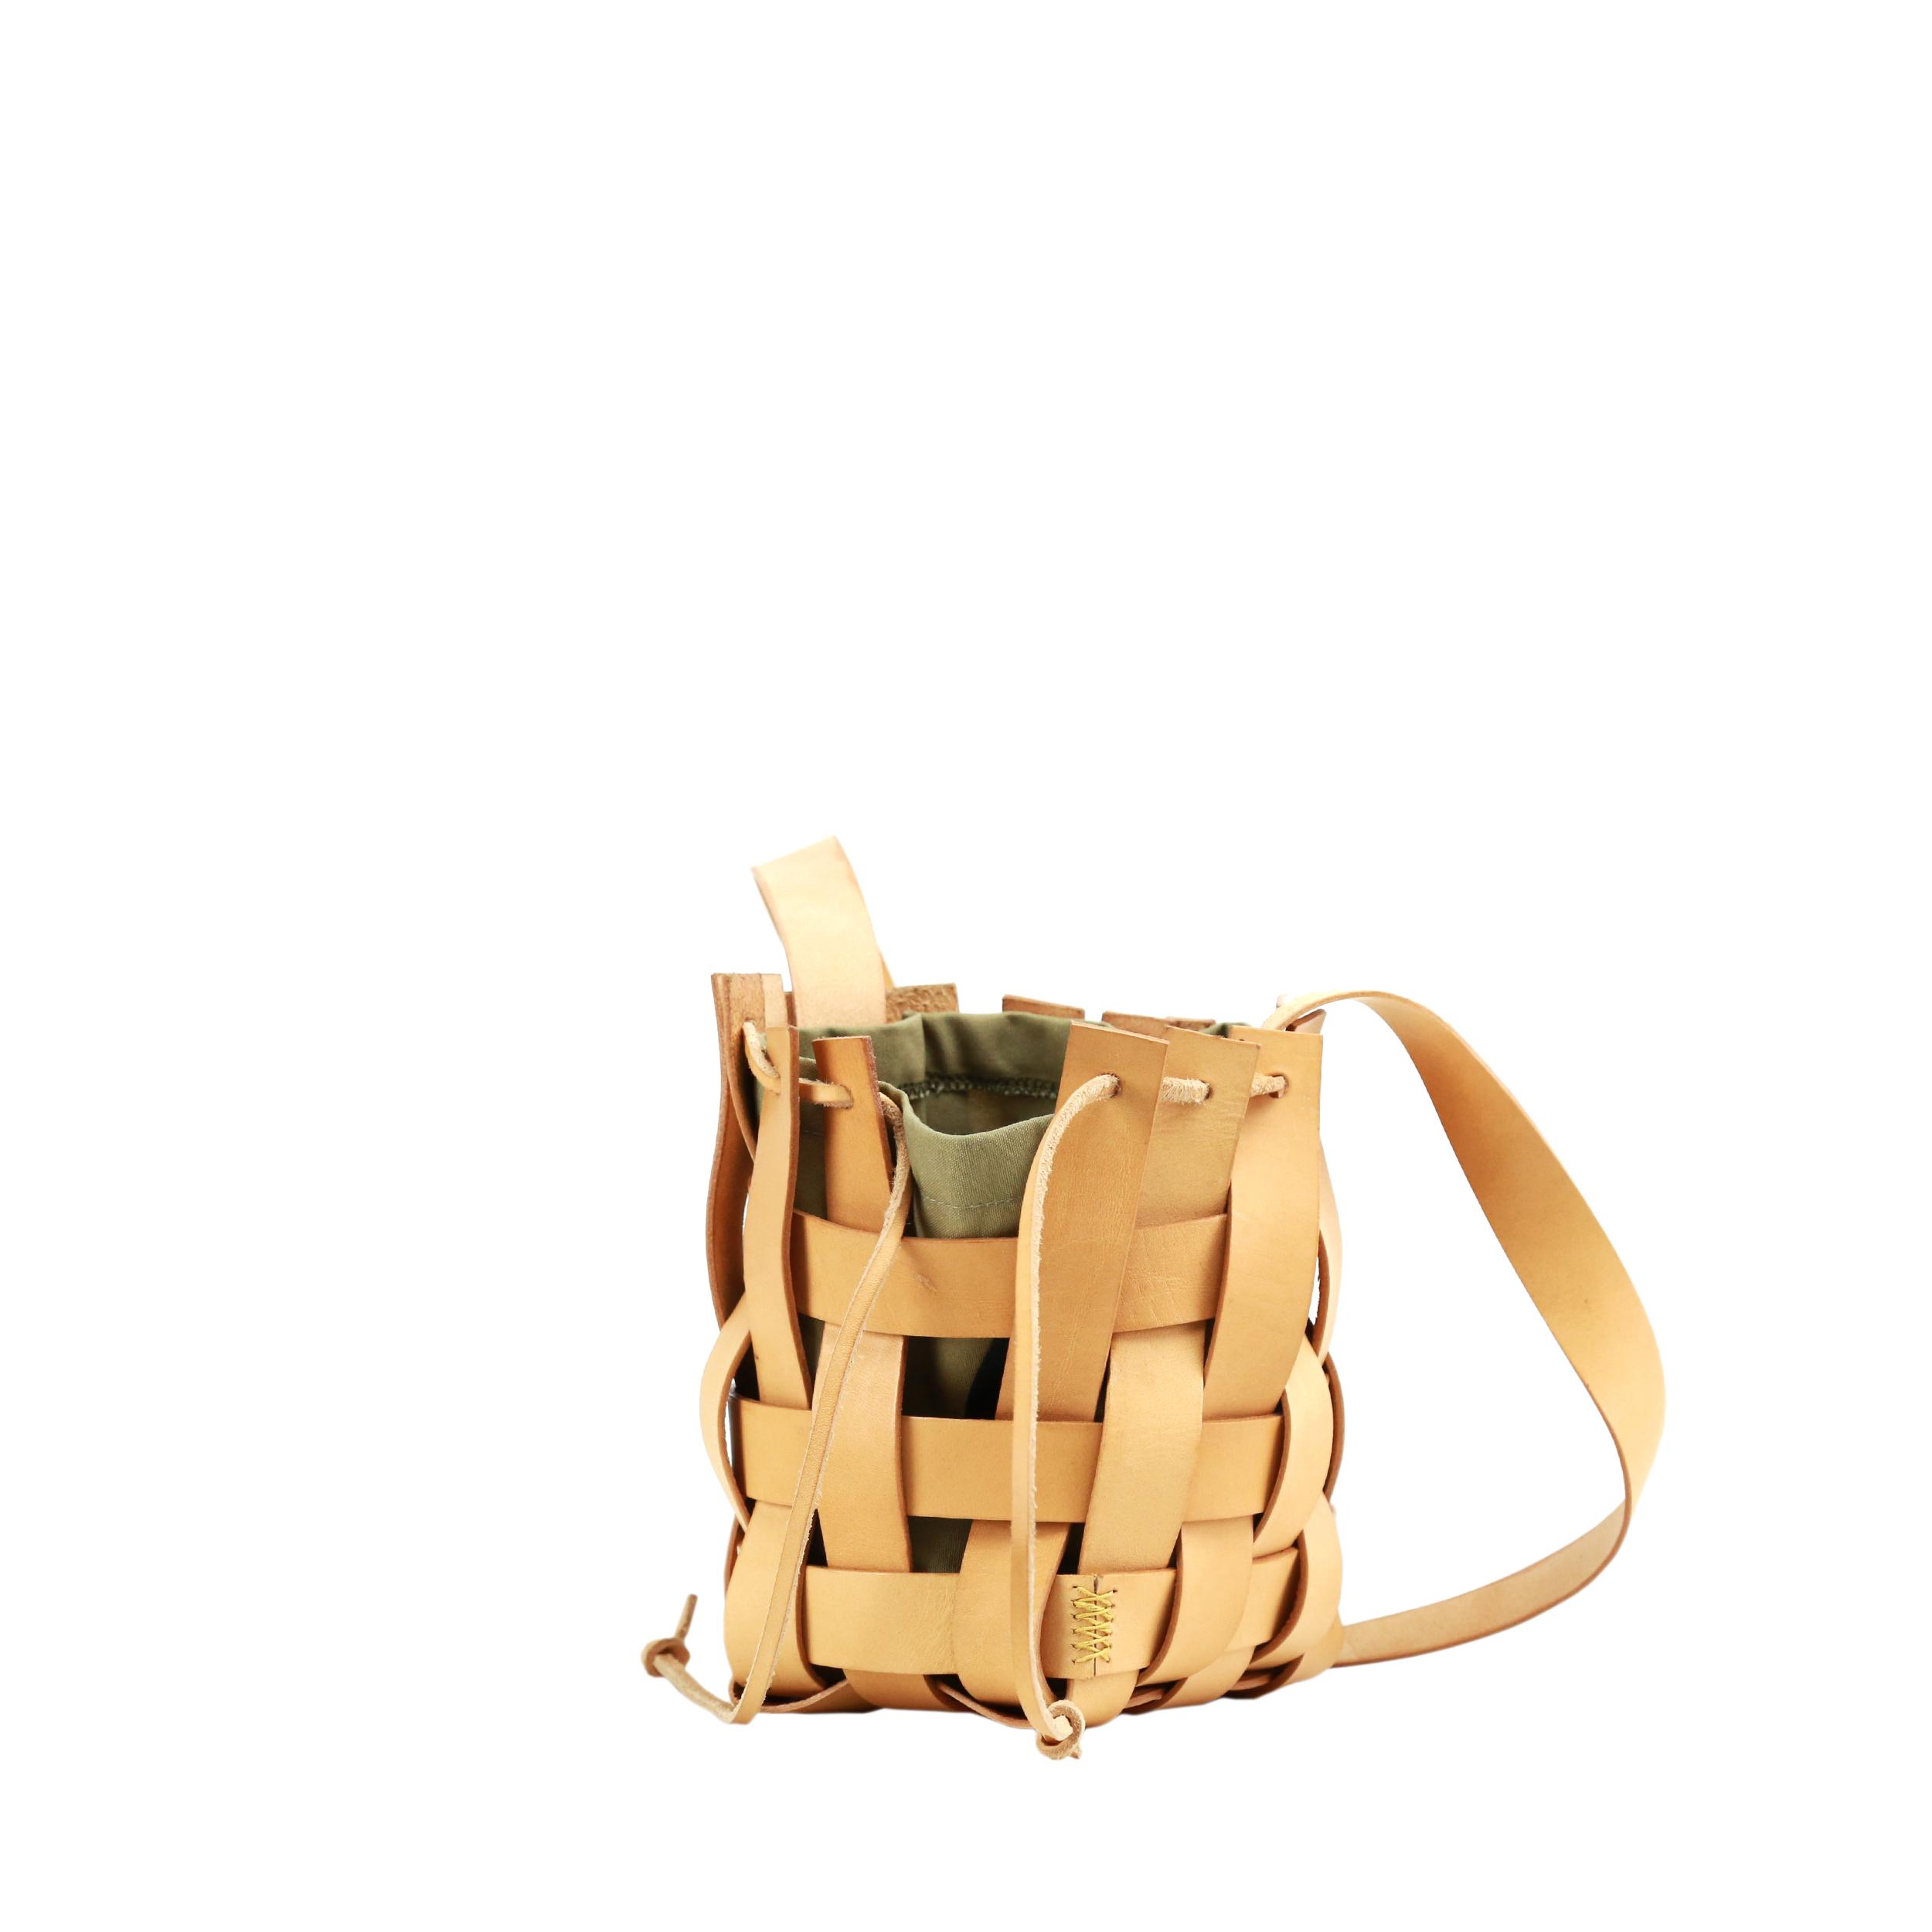 Torba-PANE-Woven-Basket-Bag-4